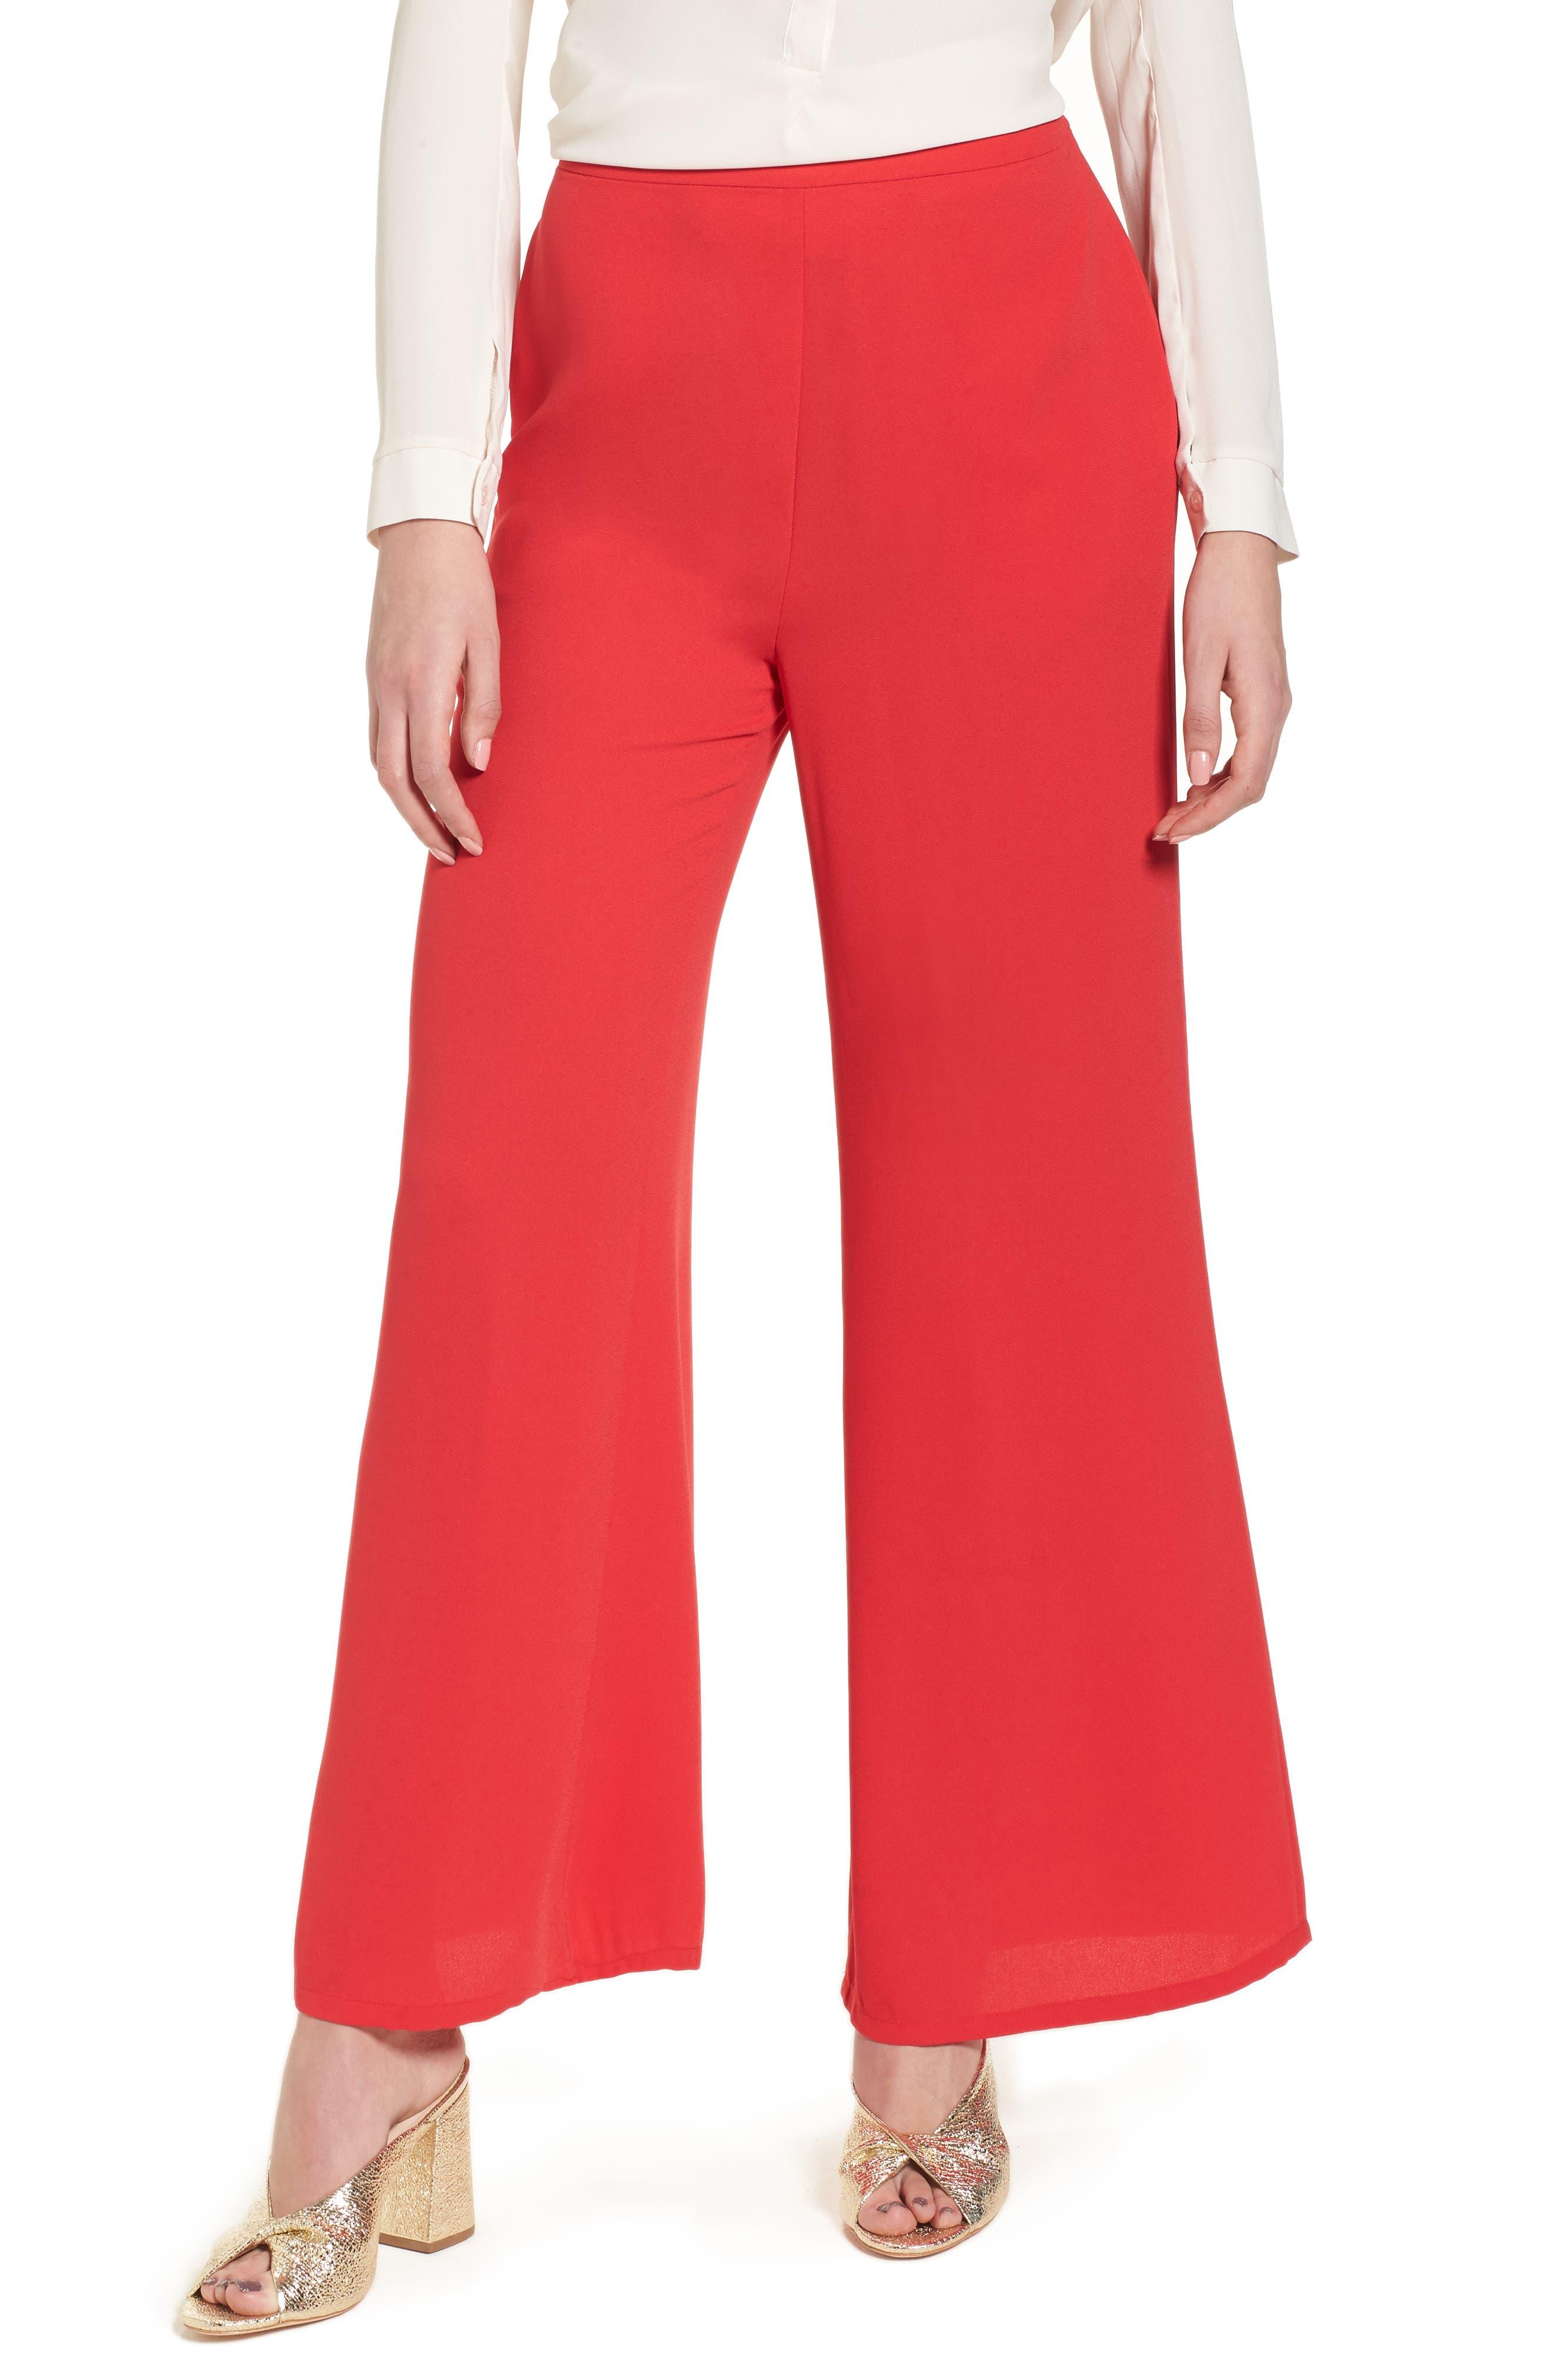 Alternate Image 1 Selected - Leith Wide Leg Pants